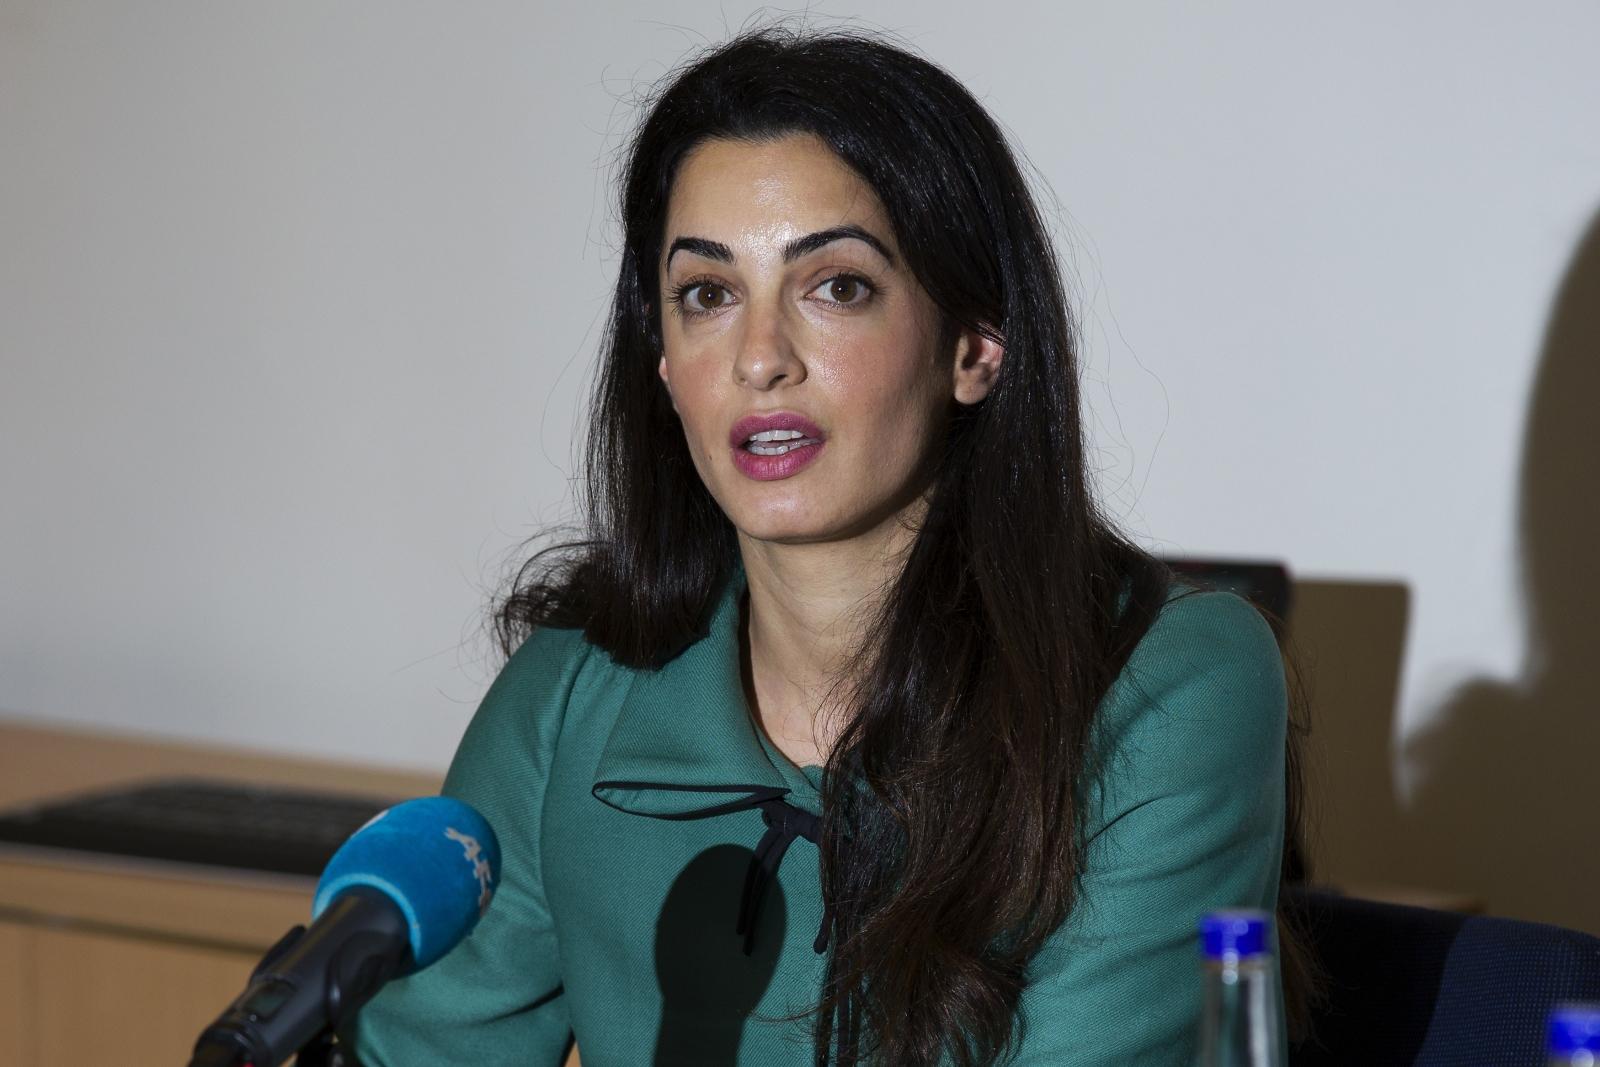 British-Lebanese human rights lawyer and George Clooney's fiancée Amal Alamuddin